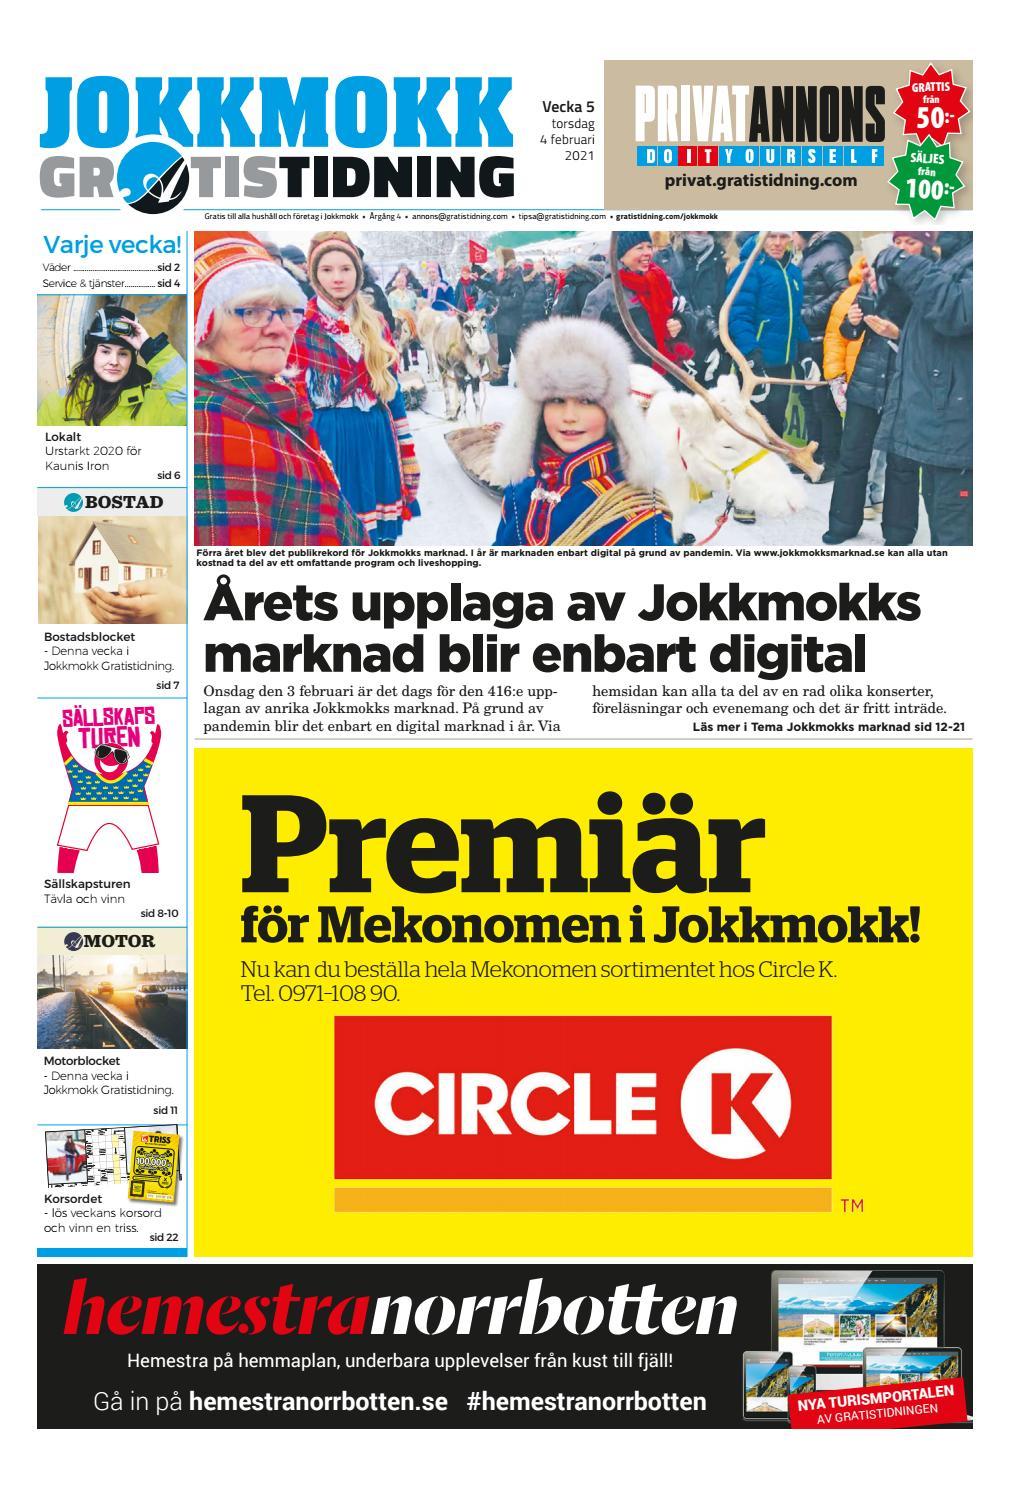 Dejta kvinnor i Jokkmokk – Sök bland tusentals kvinnor i Jokkmokk som vill börja dejta